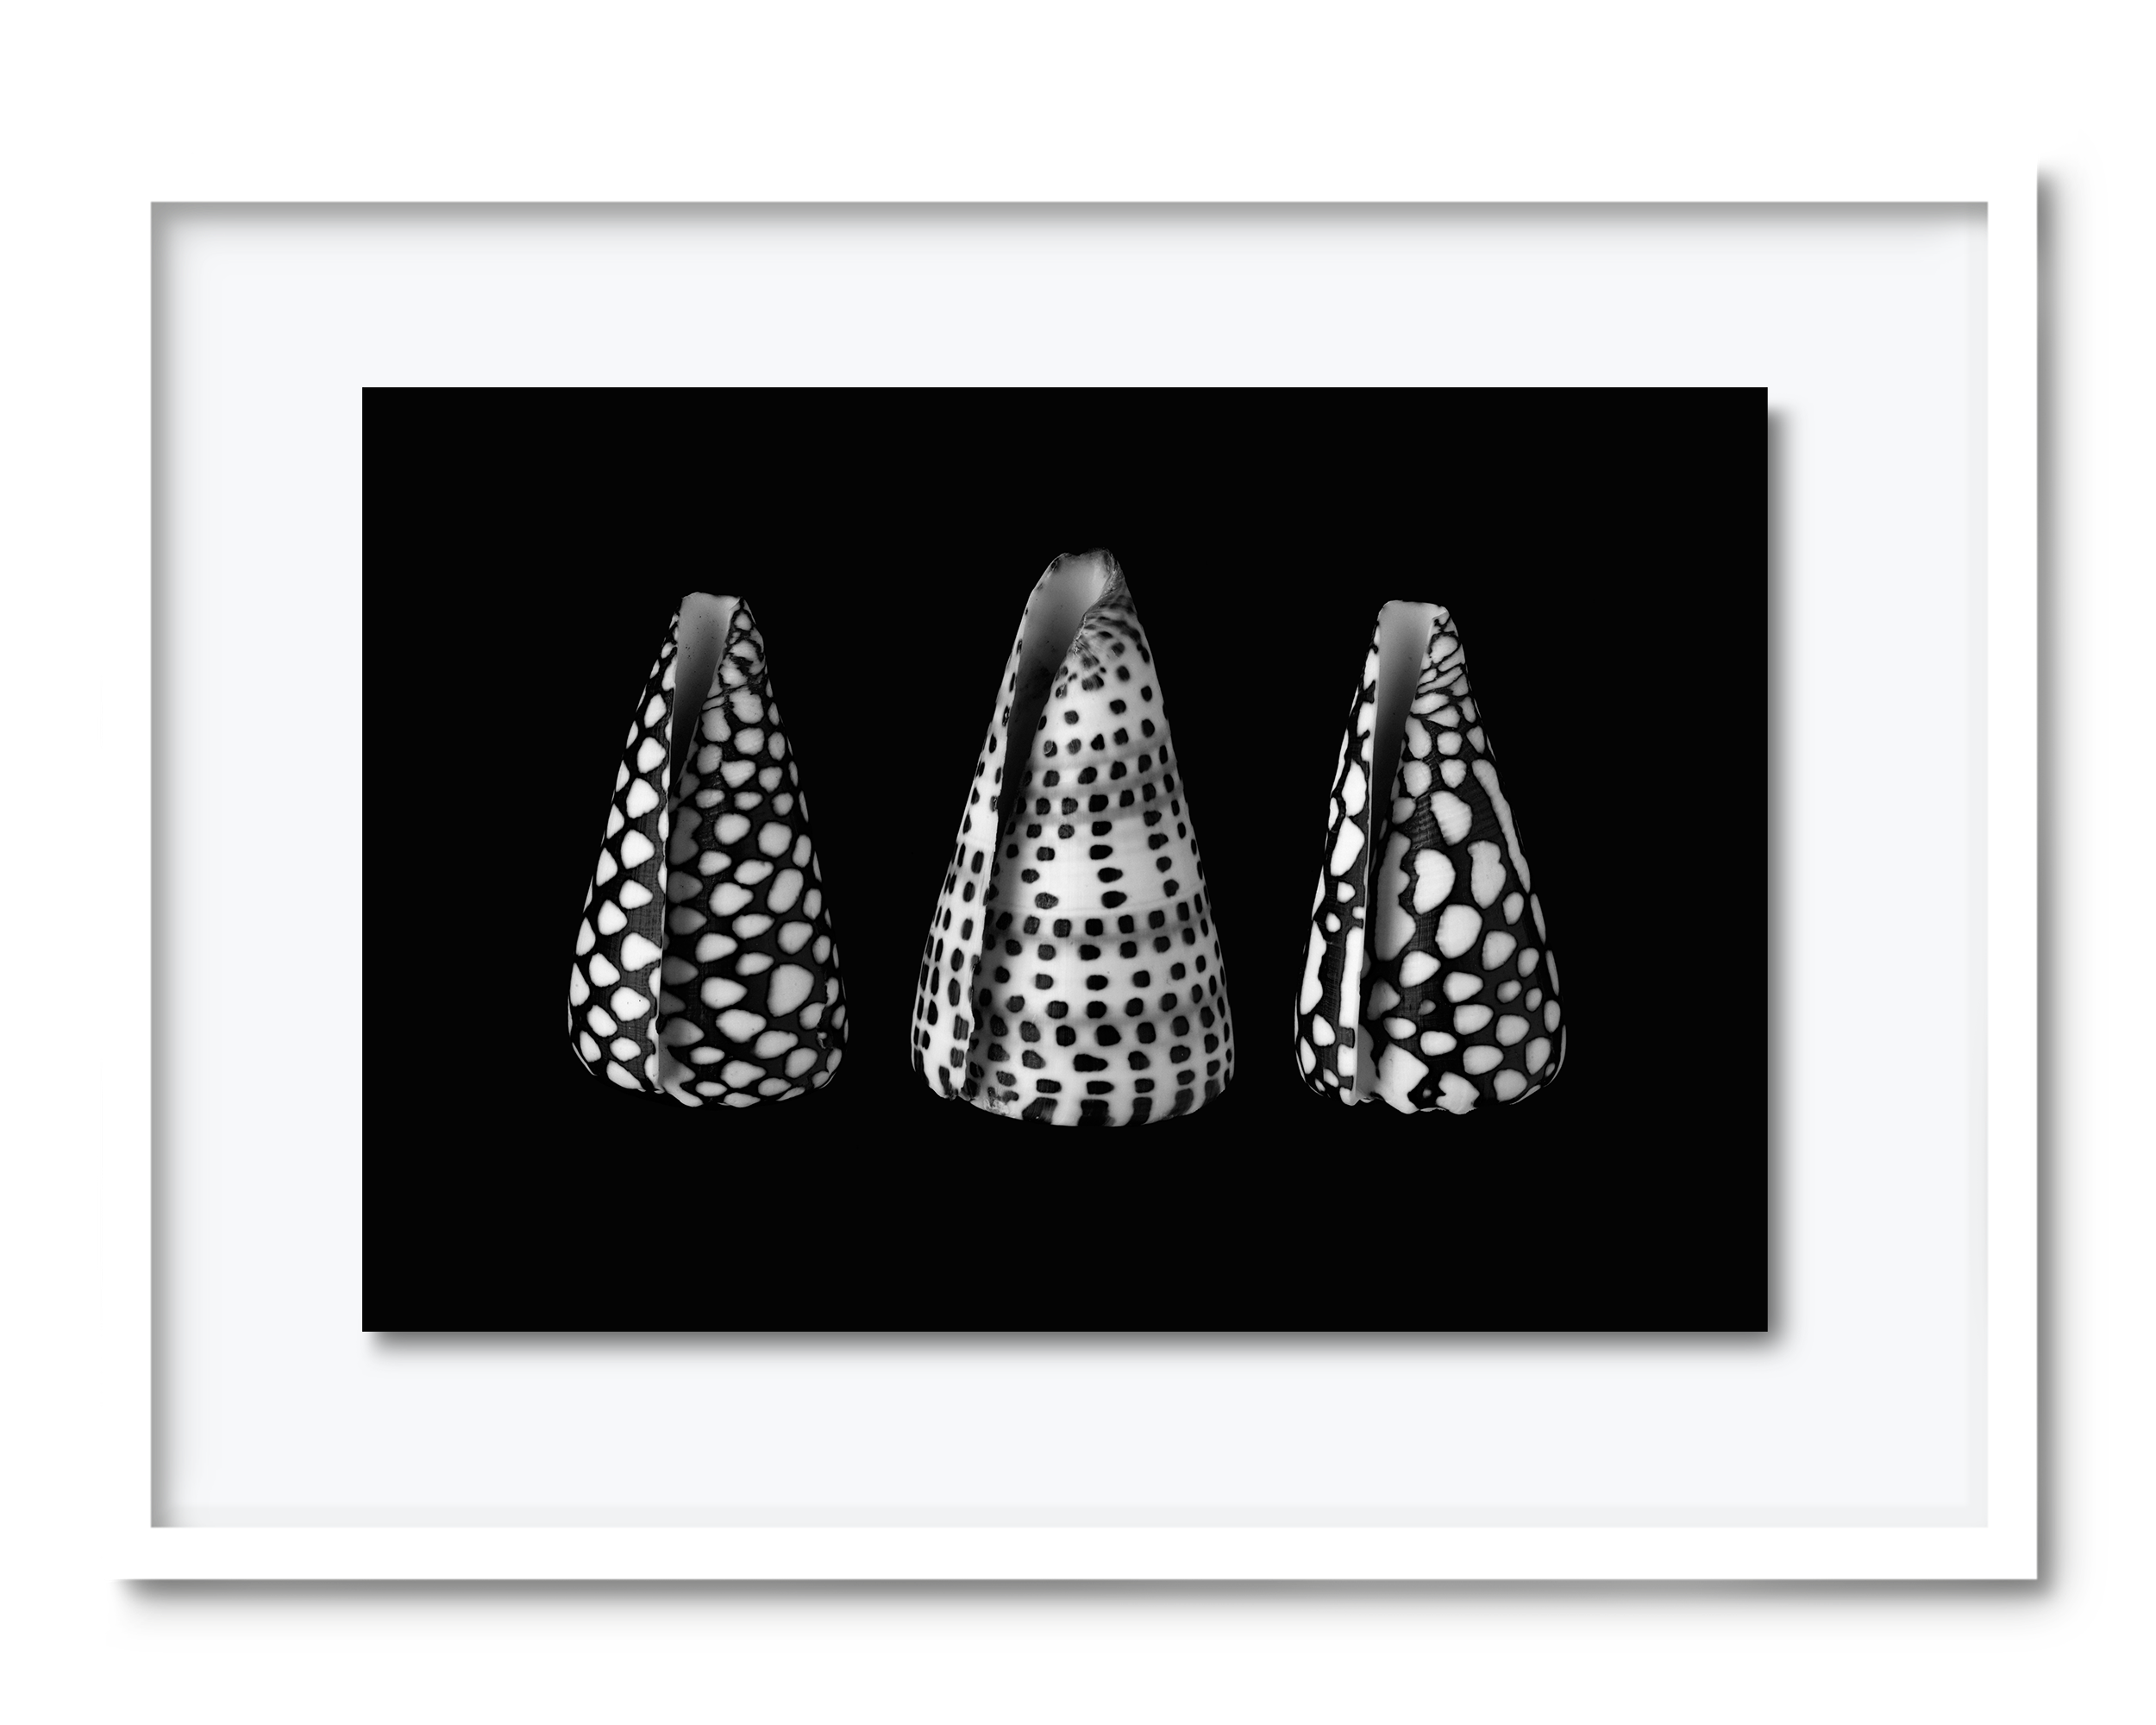 54.david-pearce-shells.png